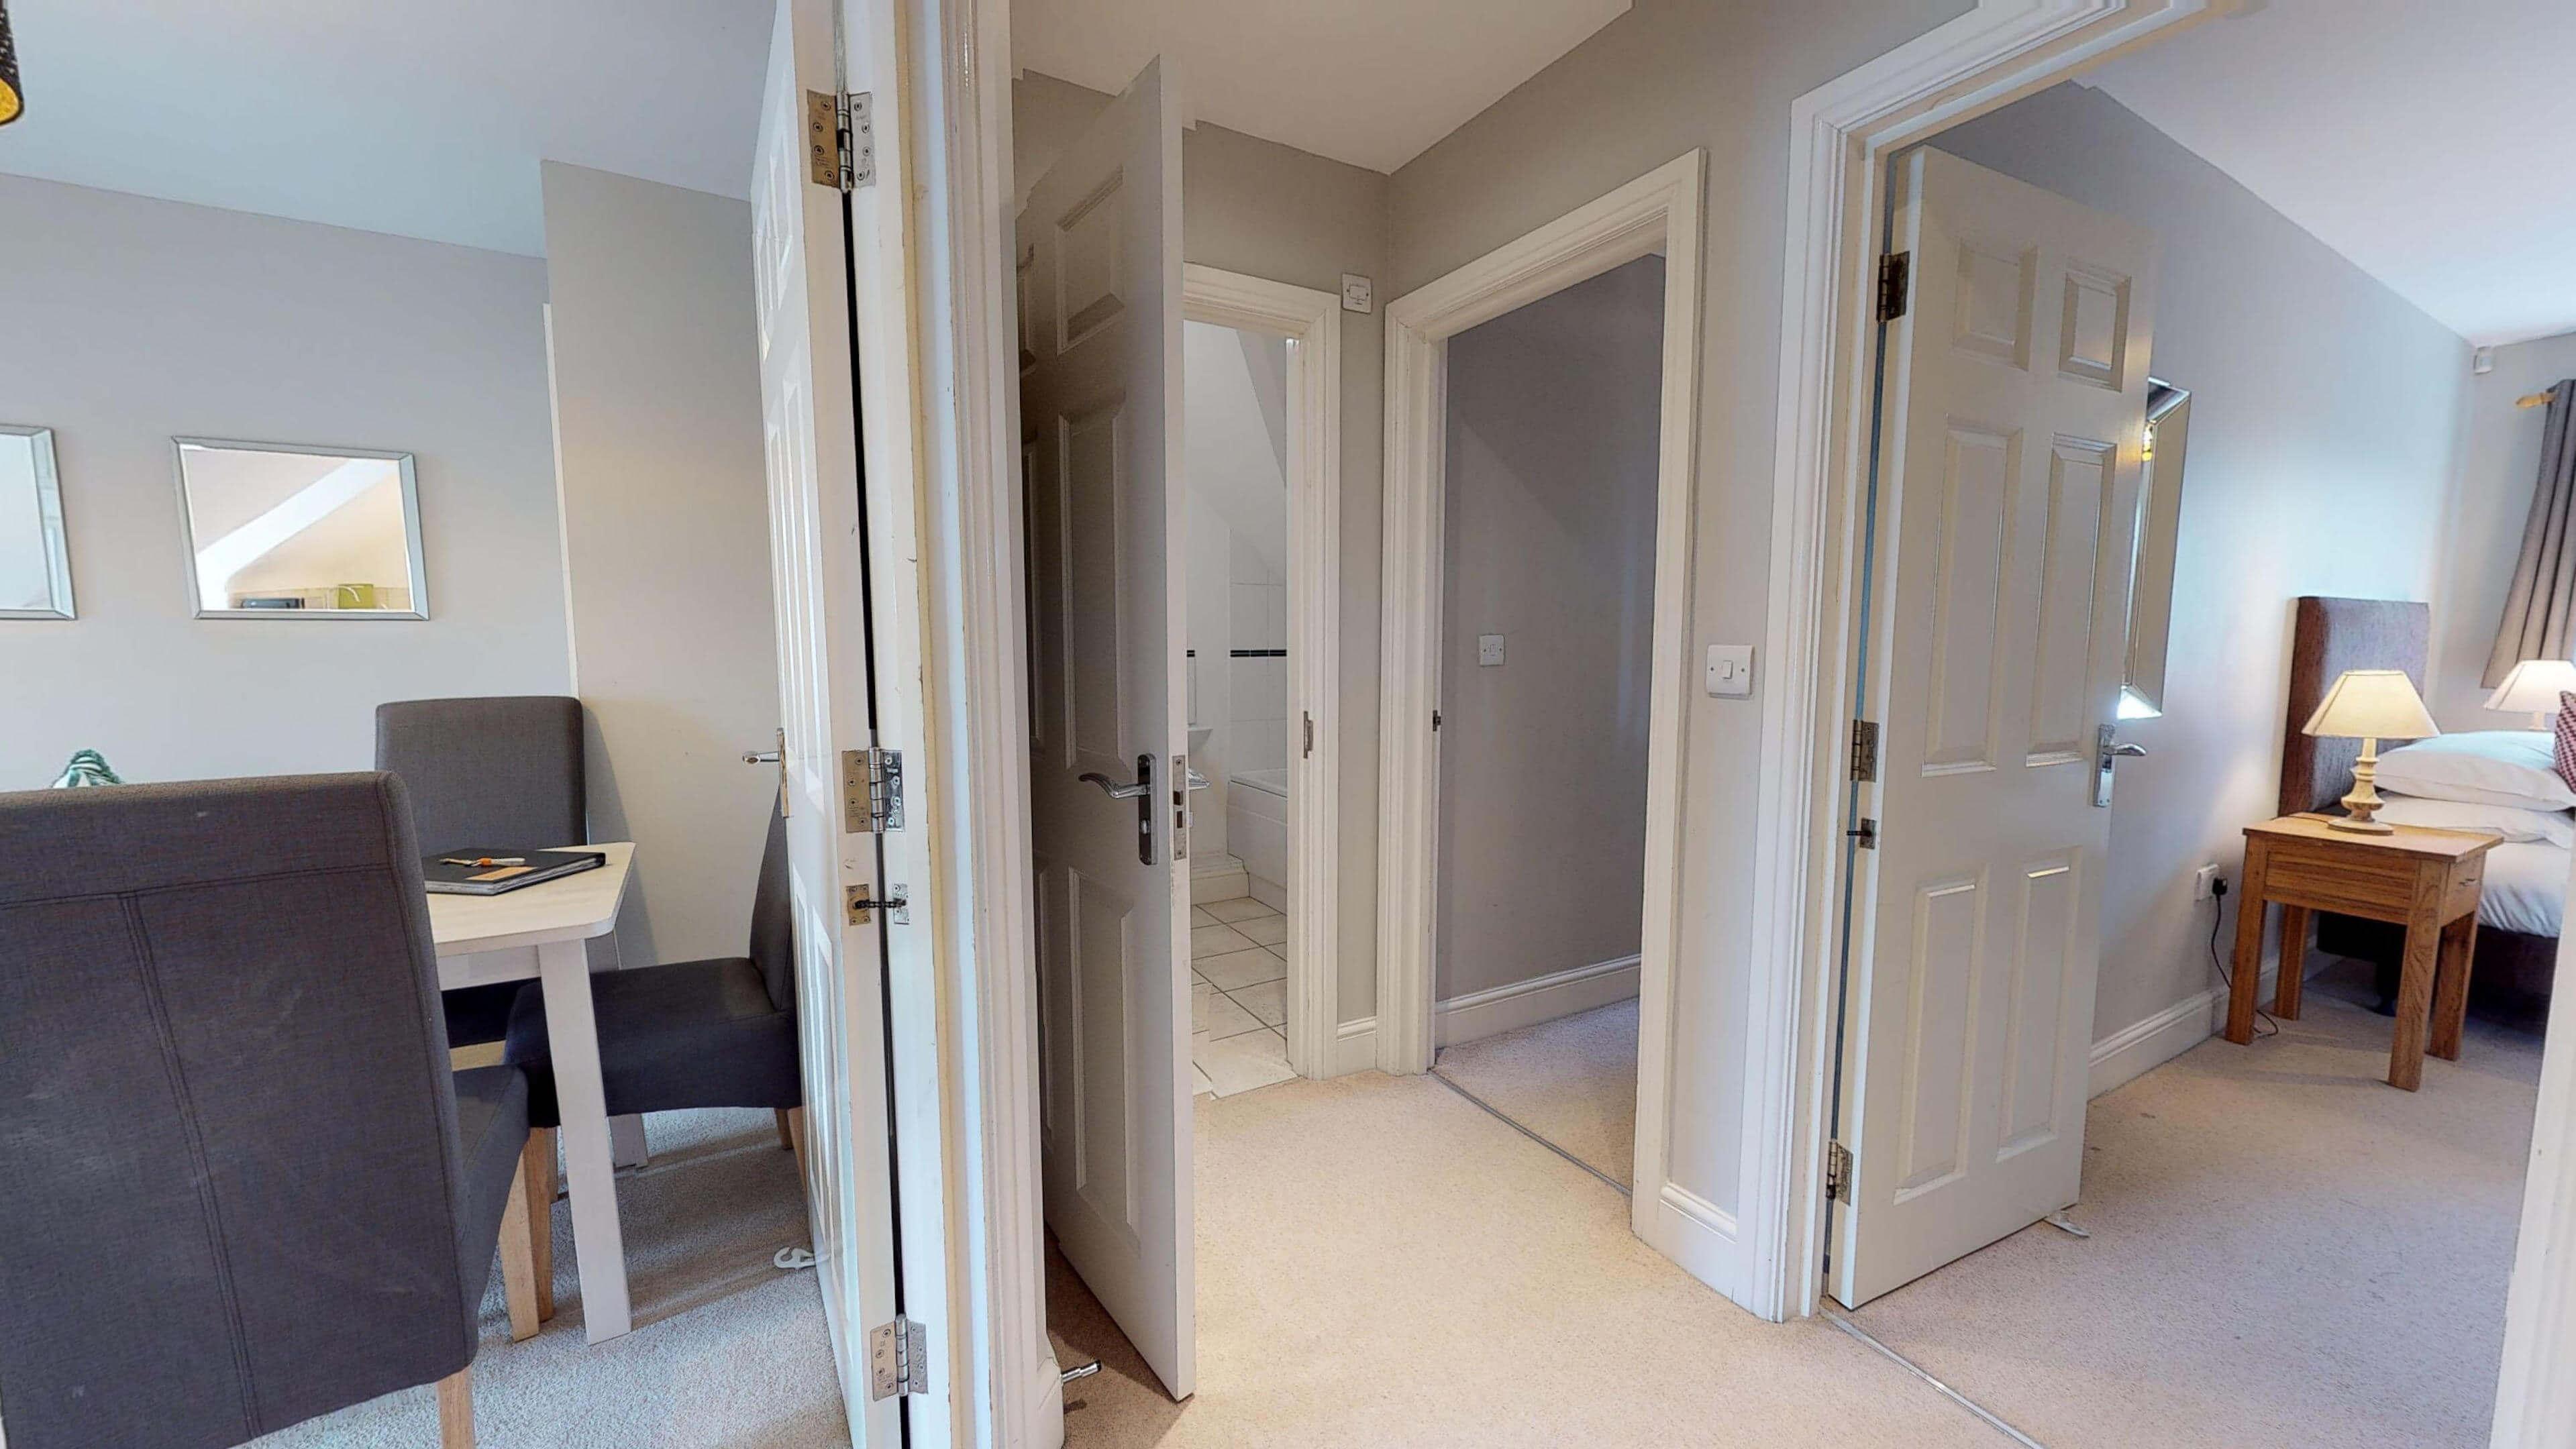 Oxford Serviced Apartment Vanbrugh Spencer Suite Hallway